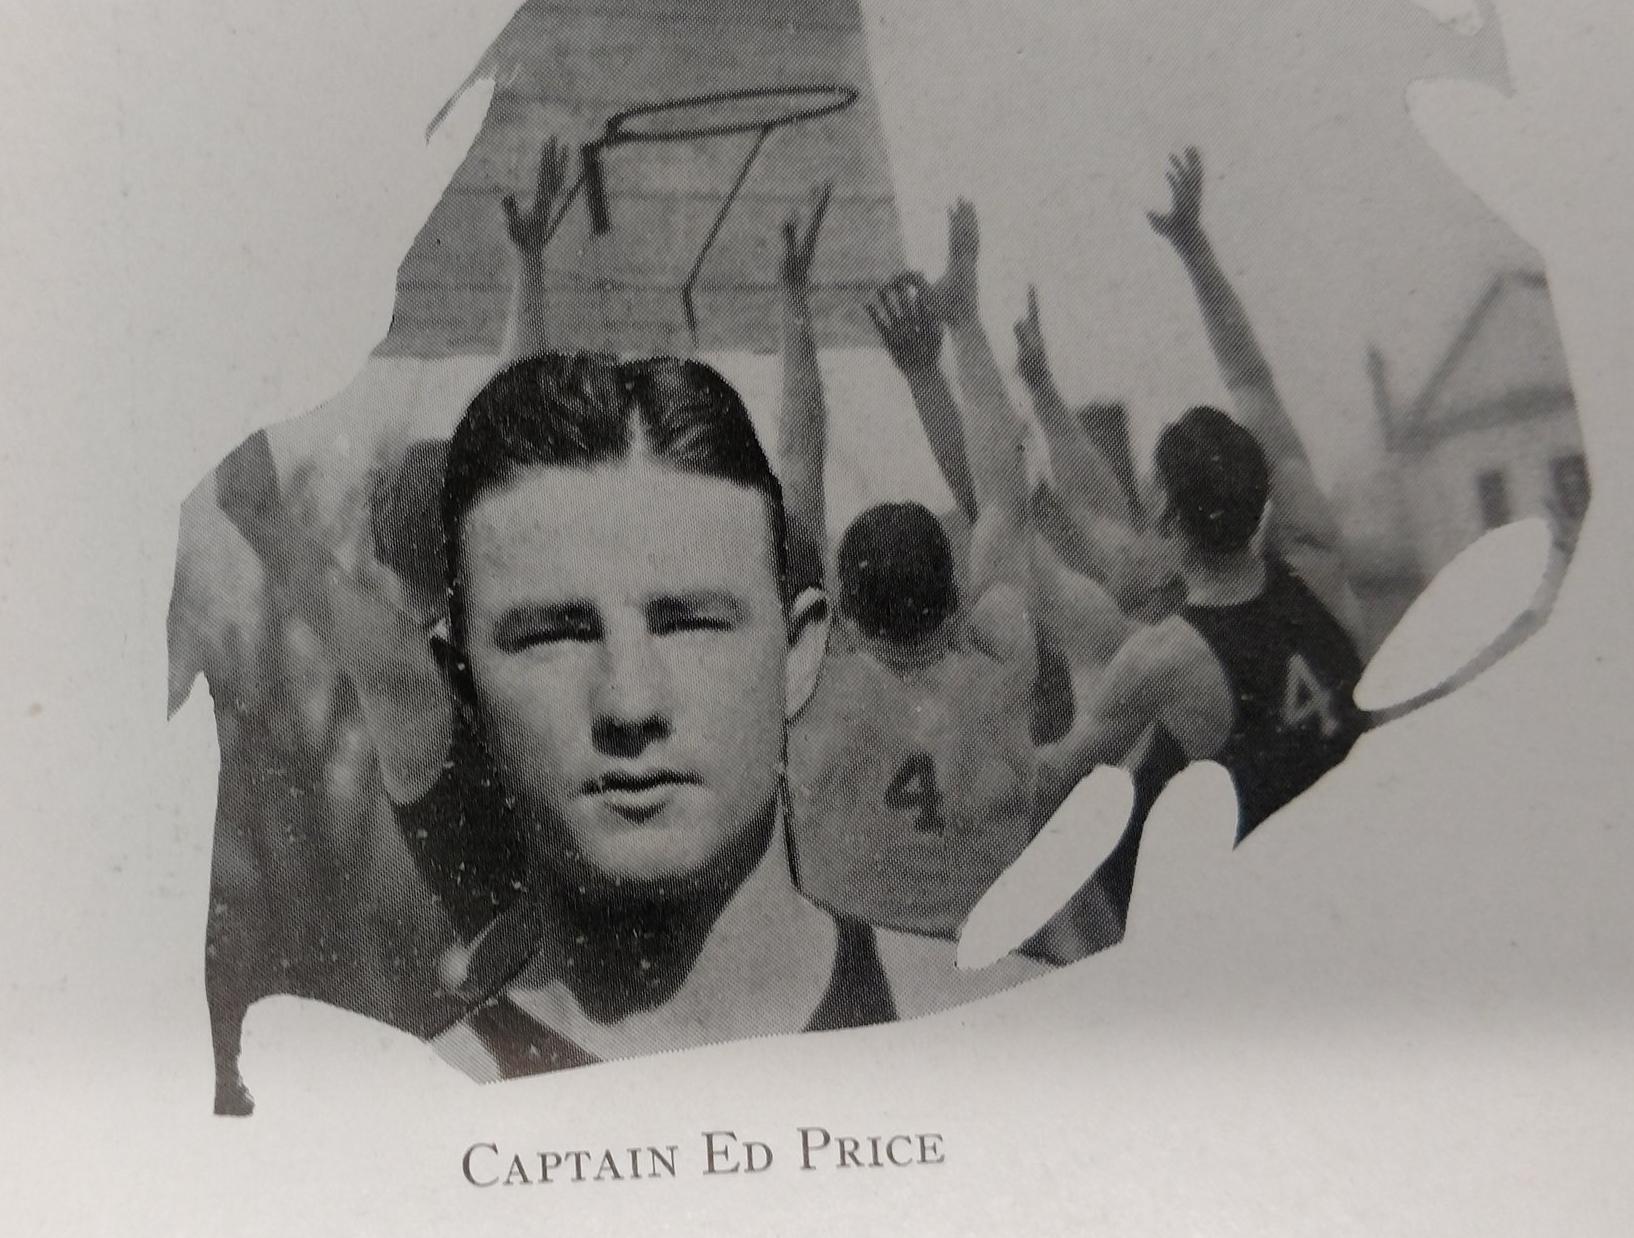 Ed Price